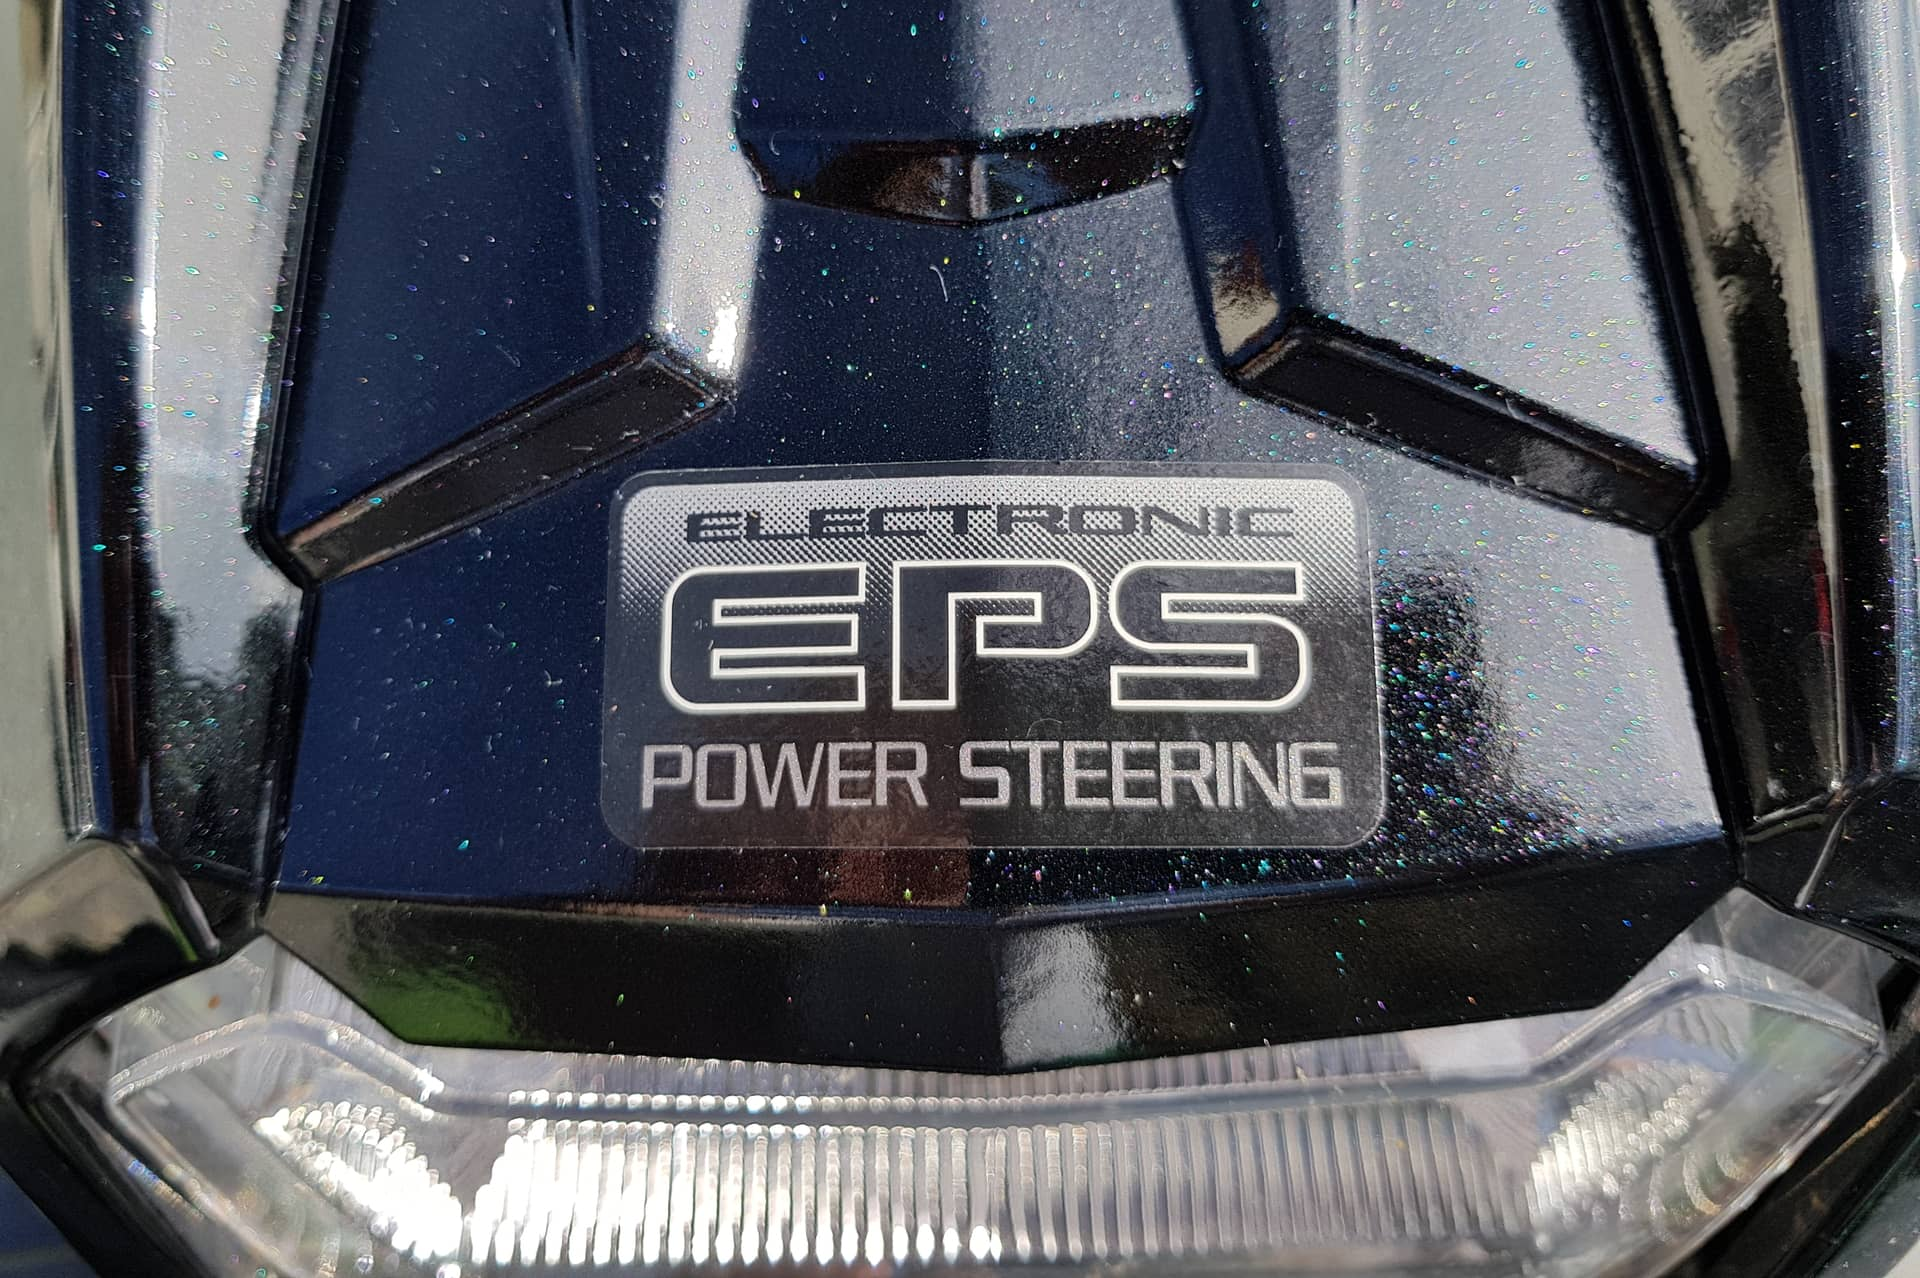 Power steering (EPS) on an ATV, is it worth it?